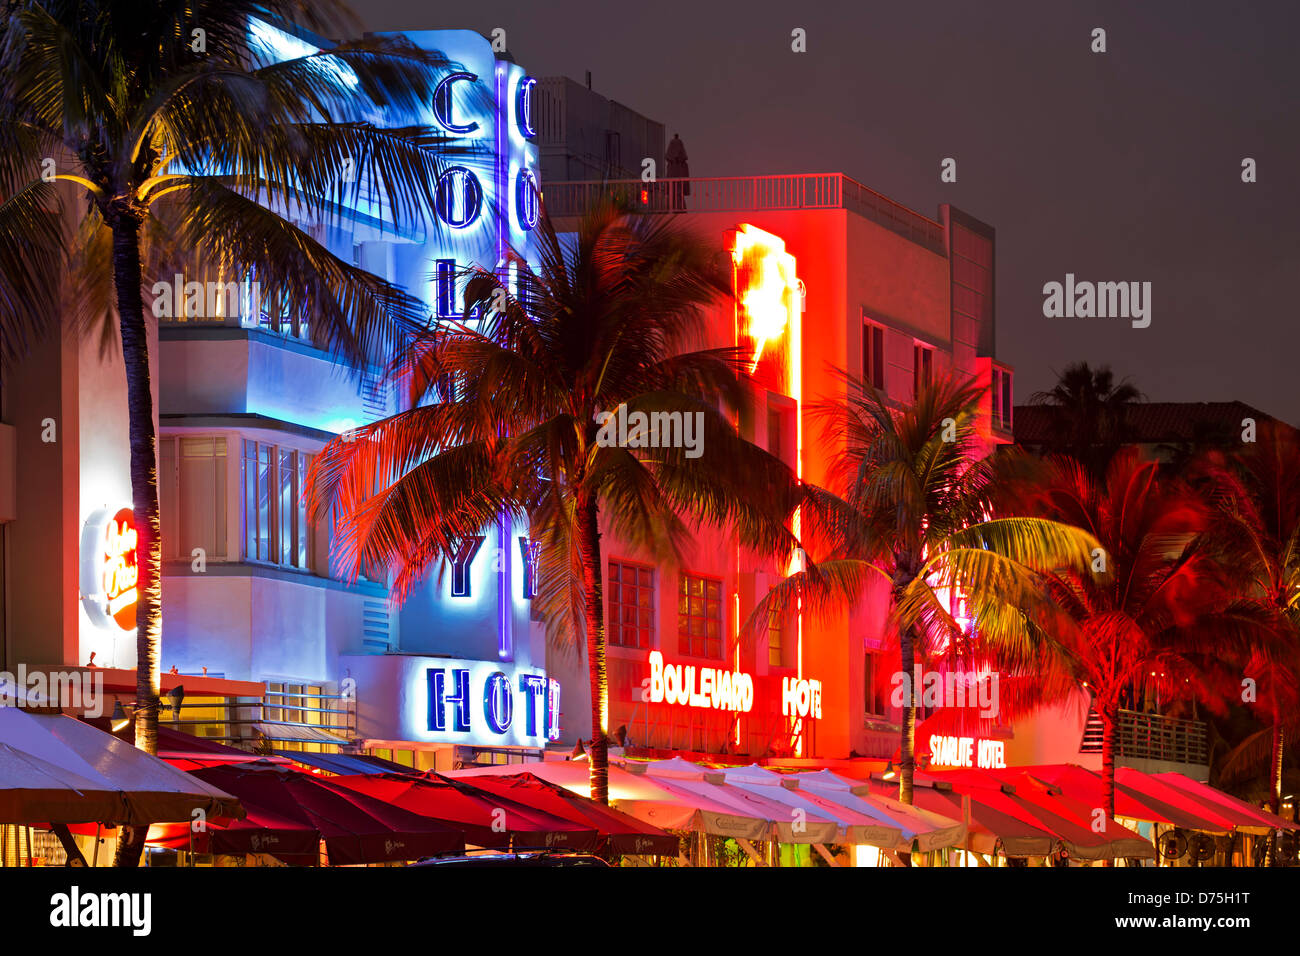 Reihe von Hotels, Colony Hotel South Beach, Miami Beach, Florida USA Stockbild